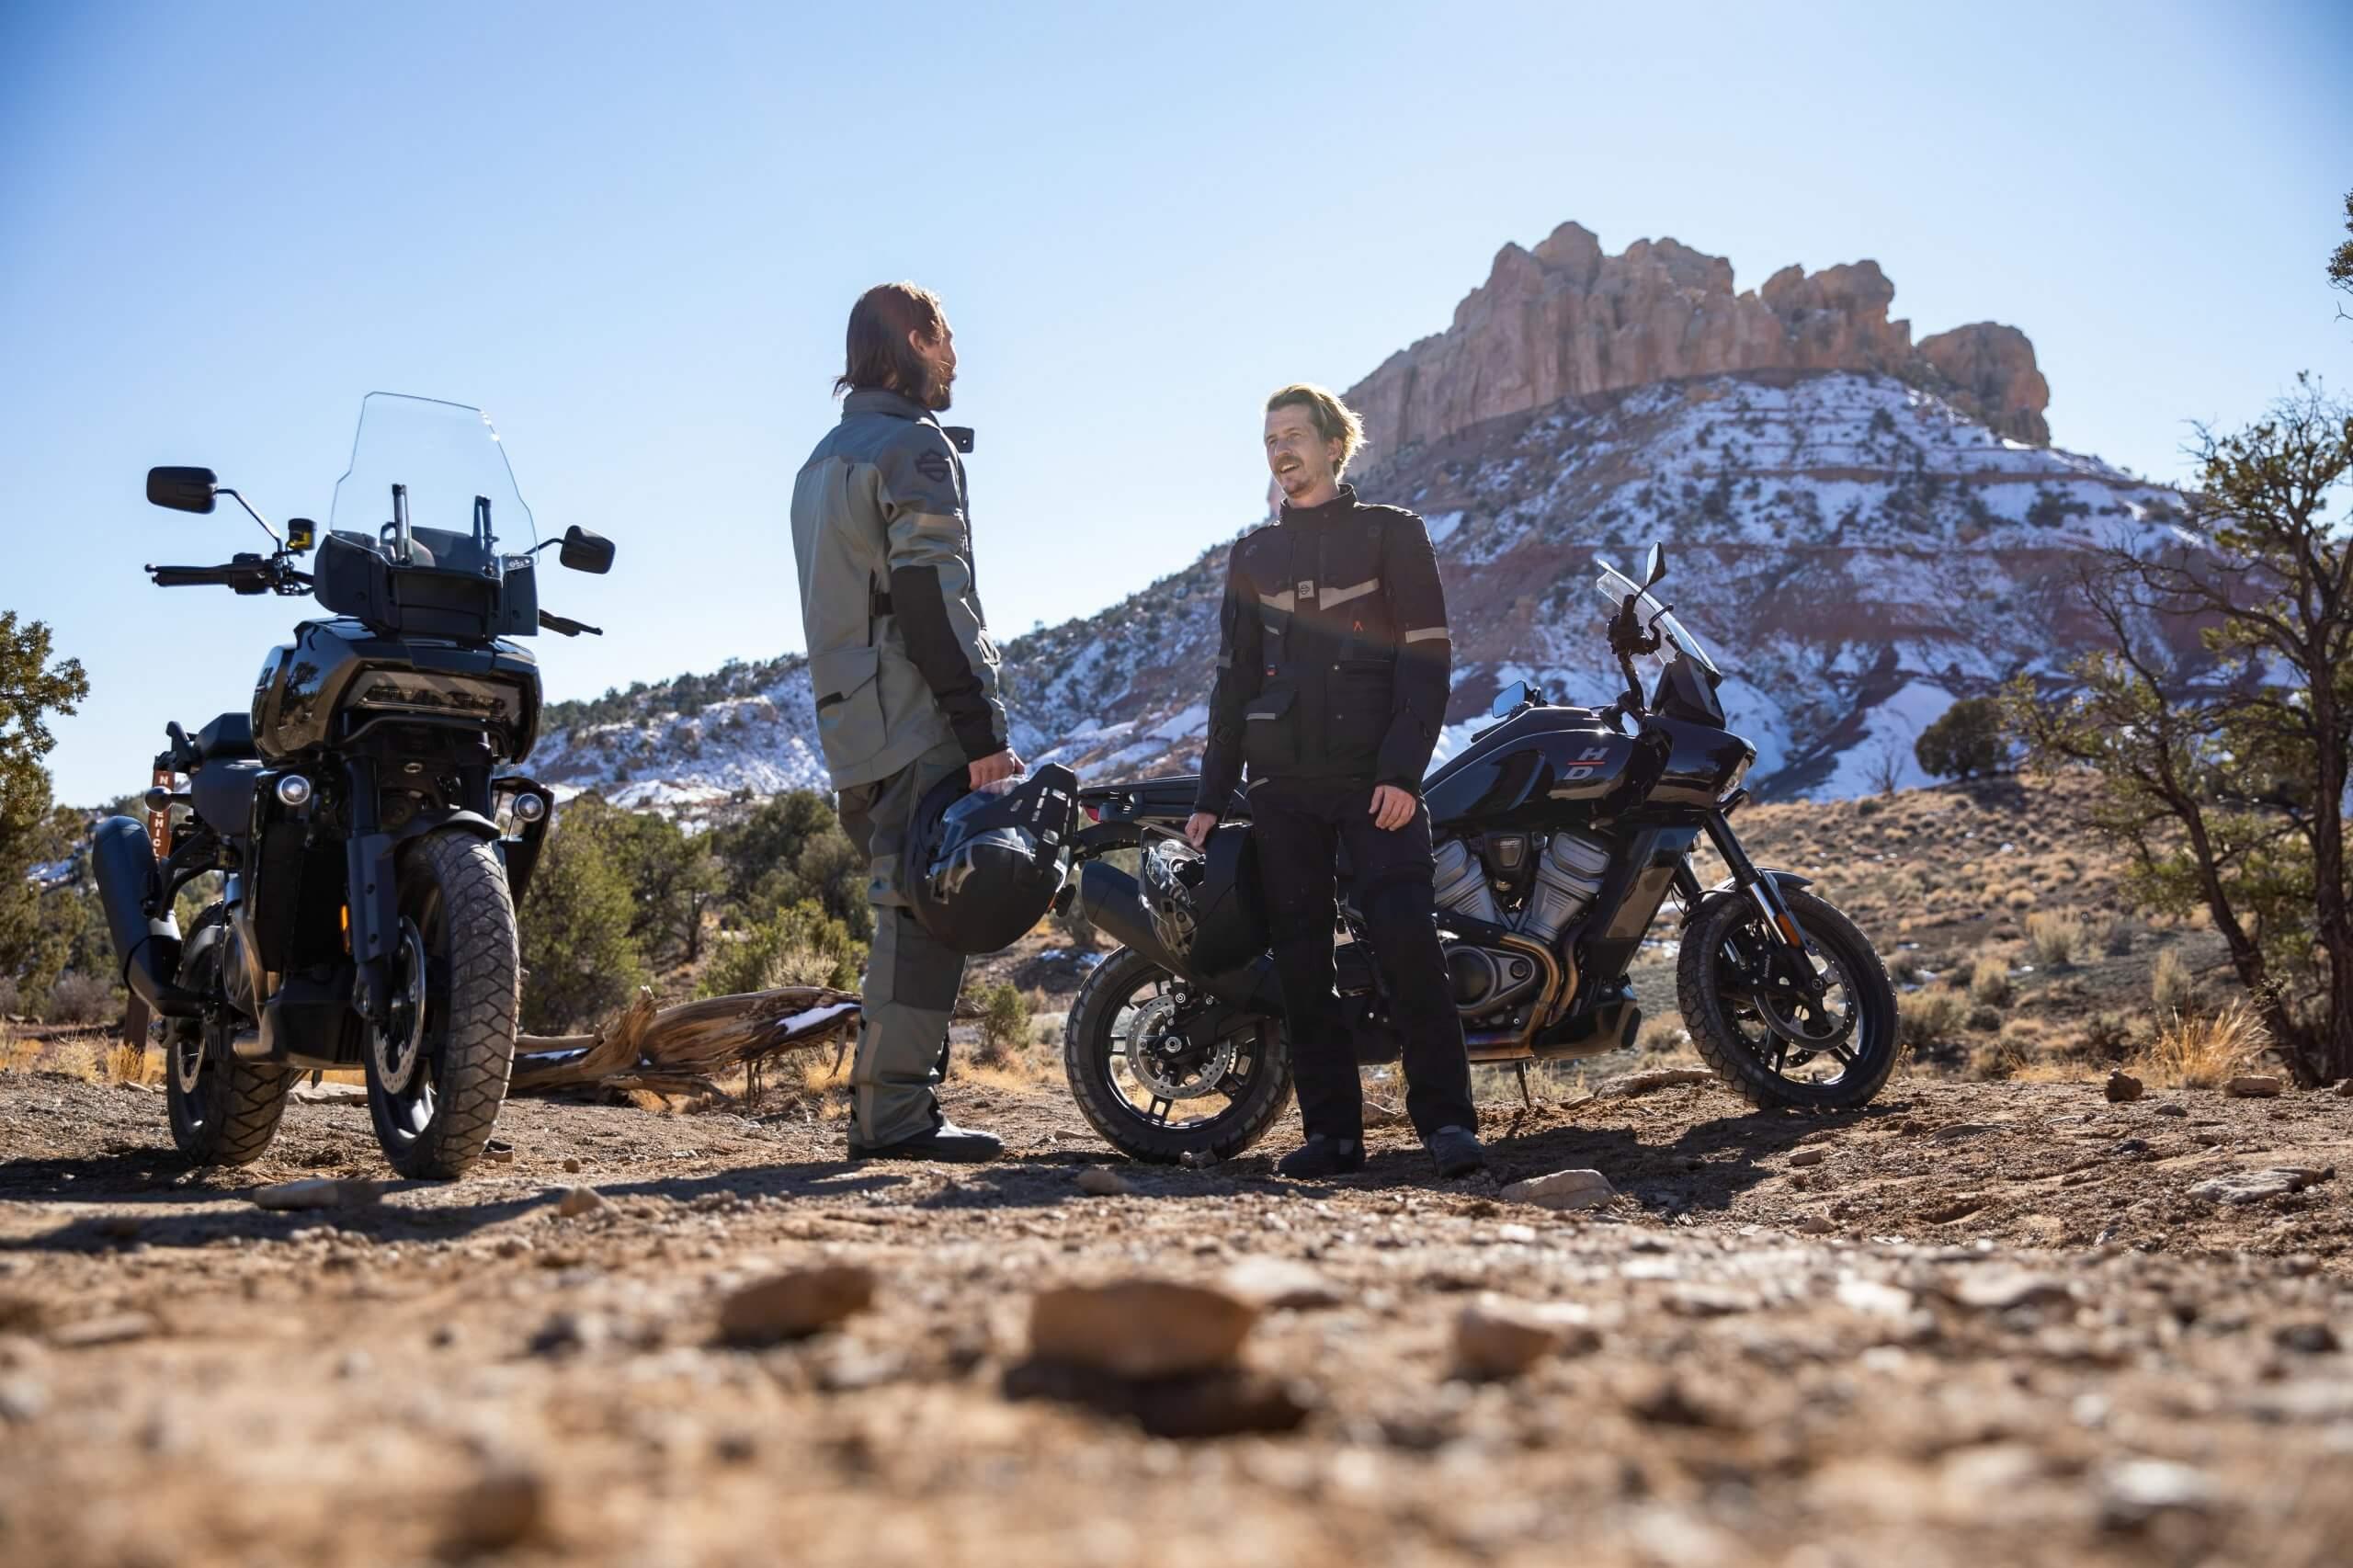 2021 Harley-Davidson Adventure Touring